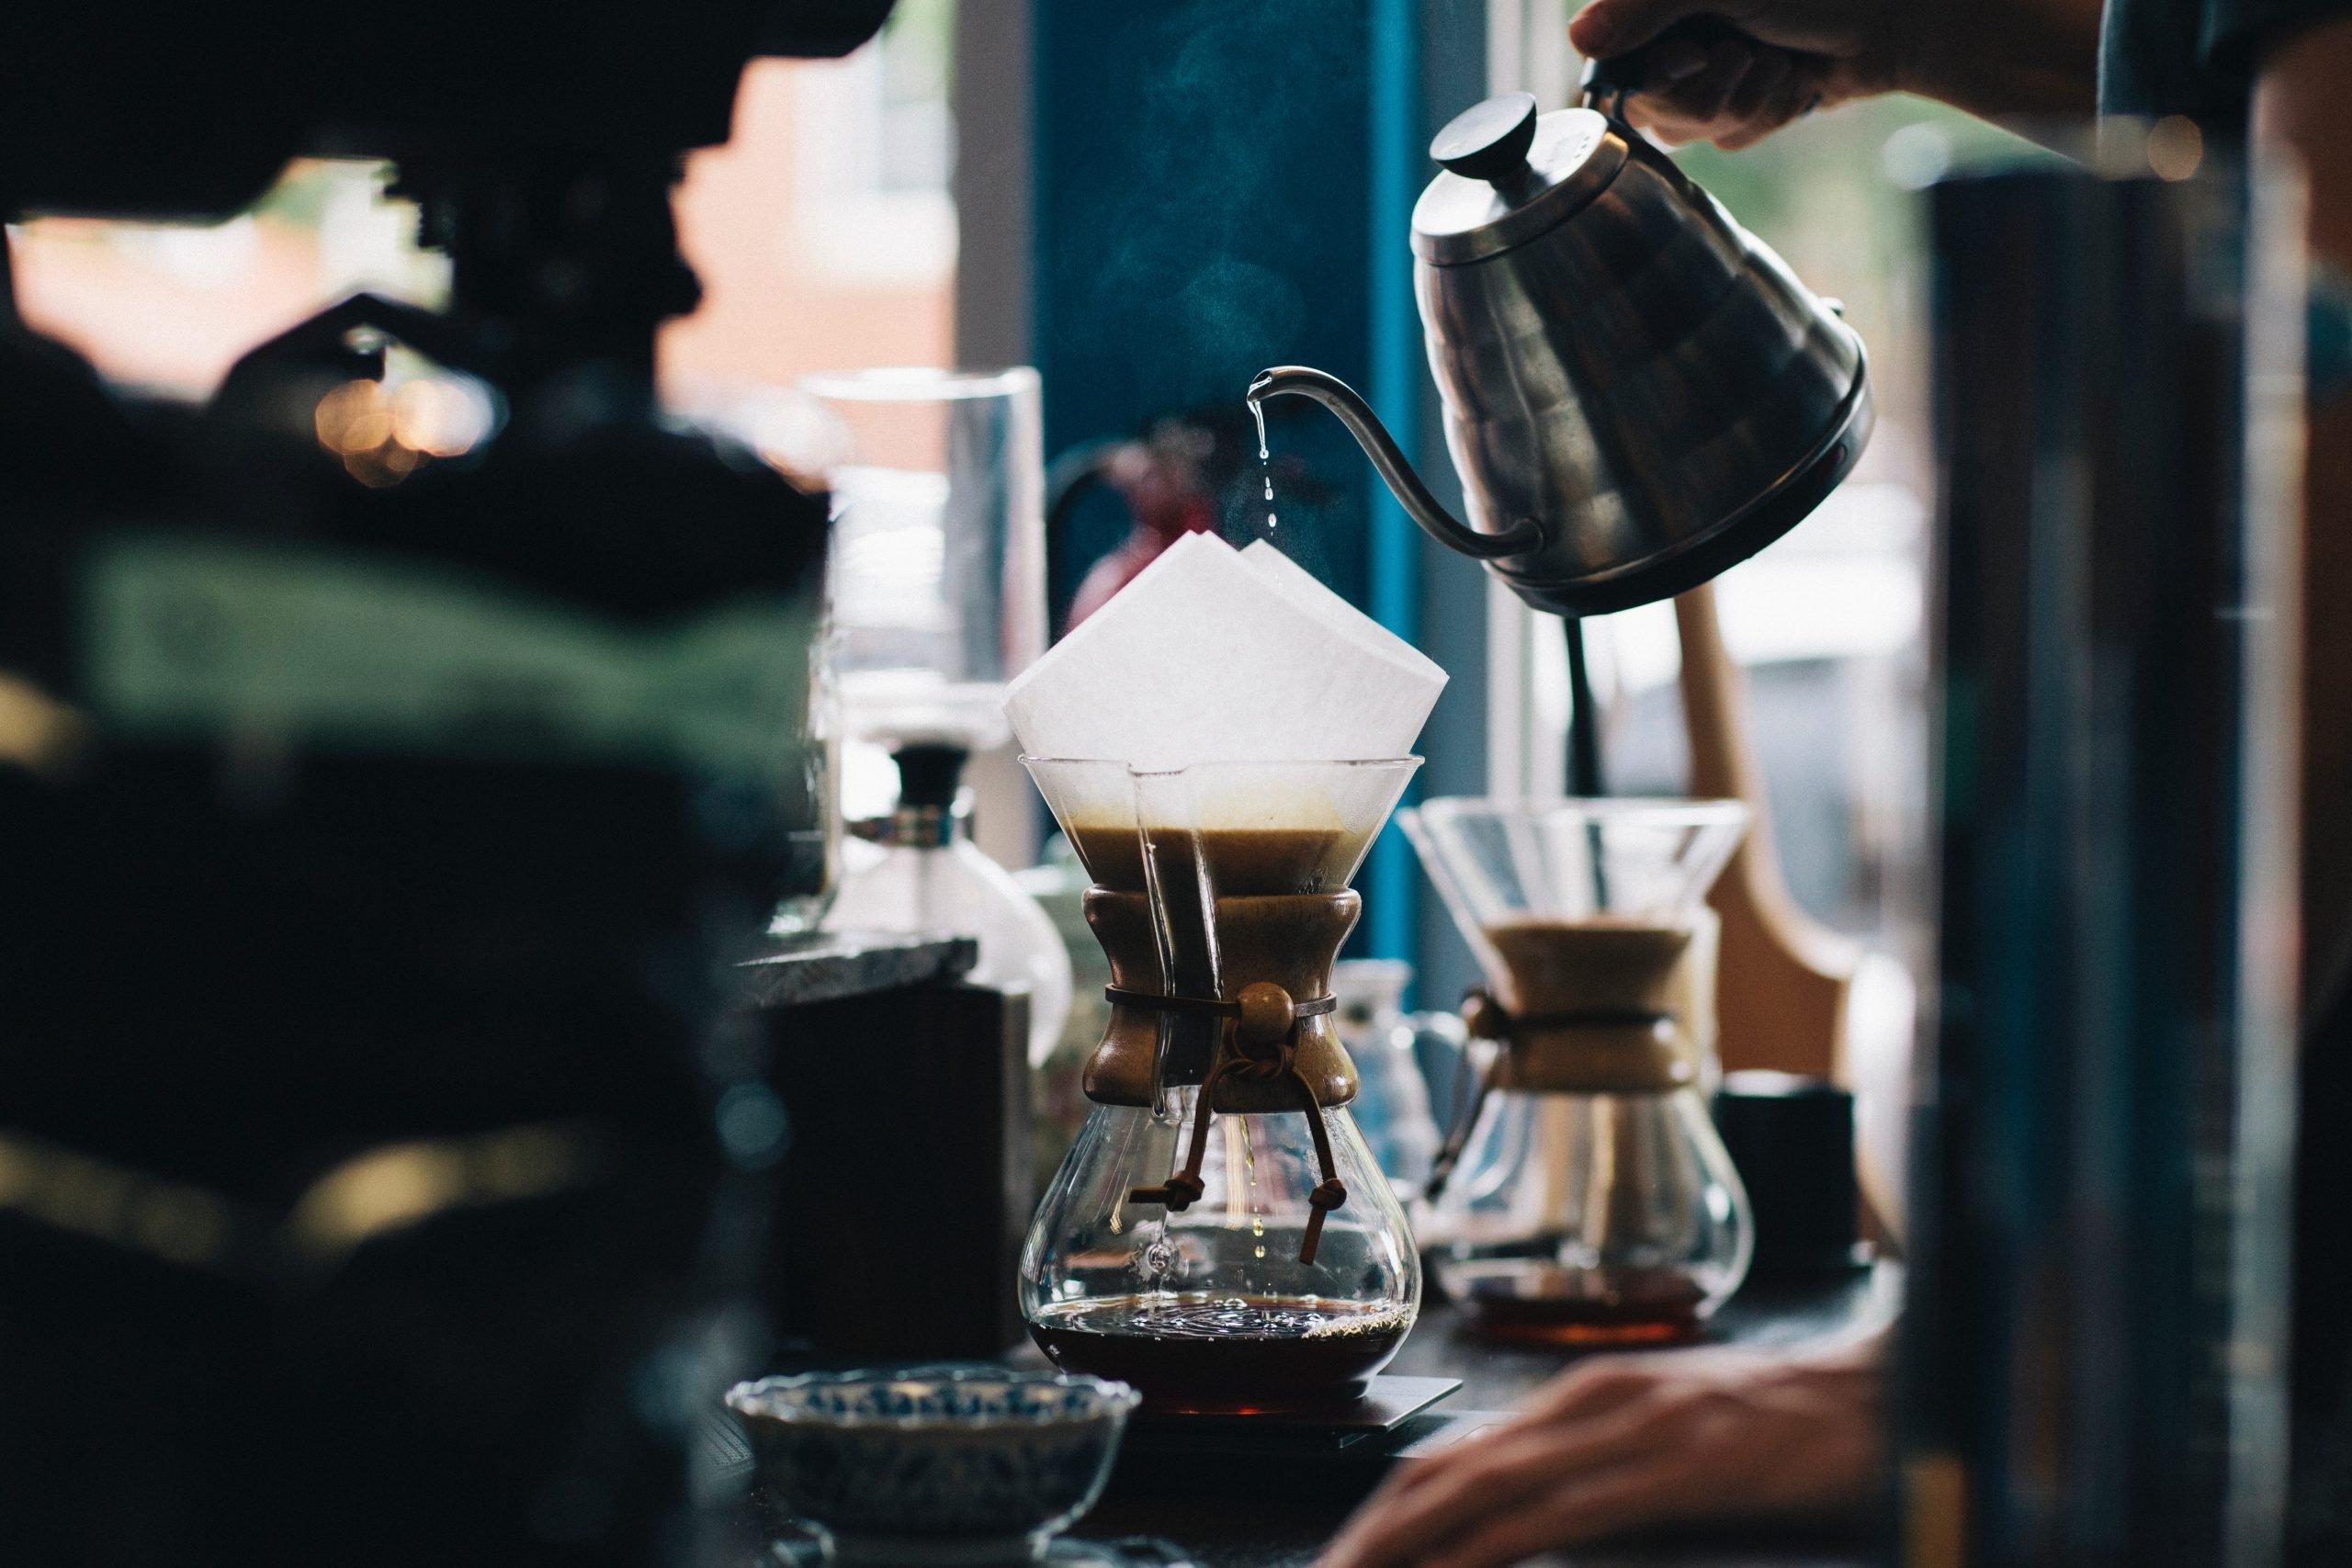 Brewing coffee in a jug